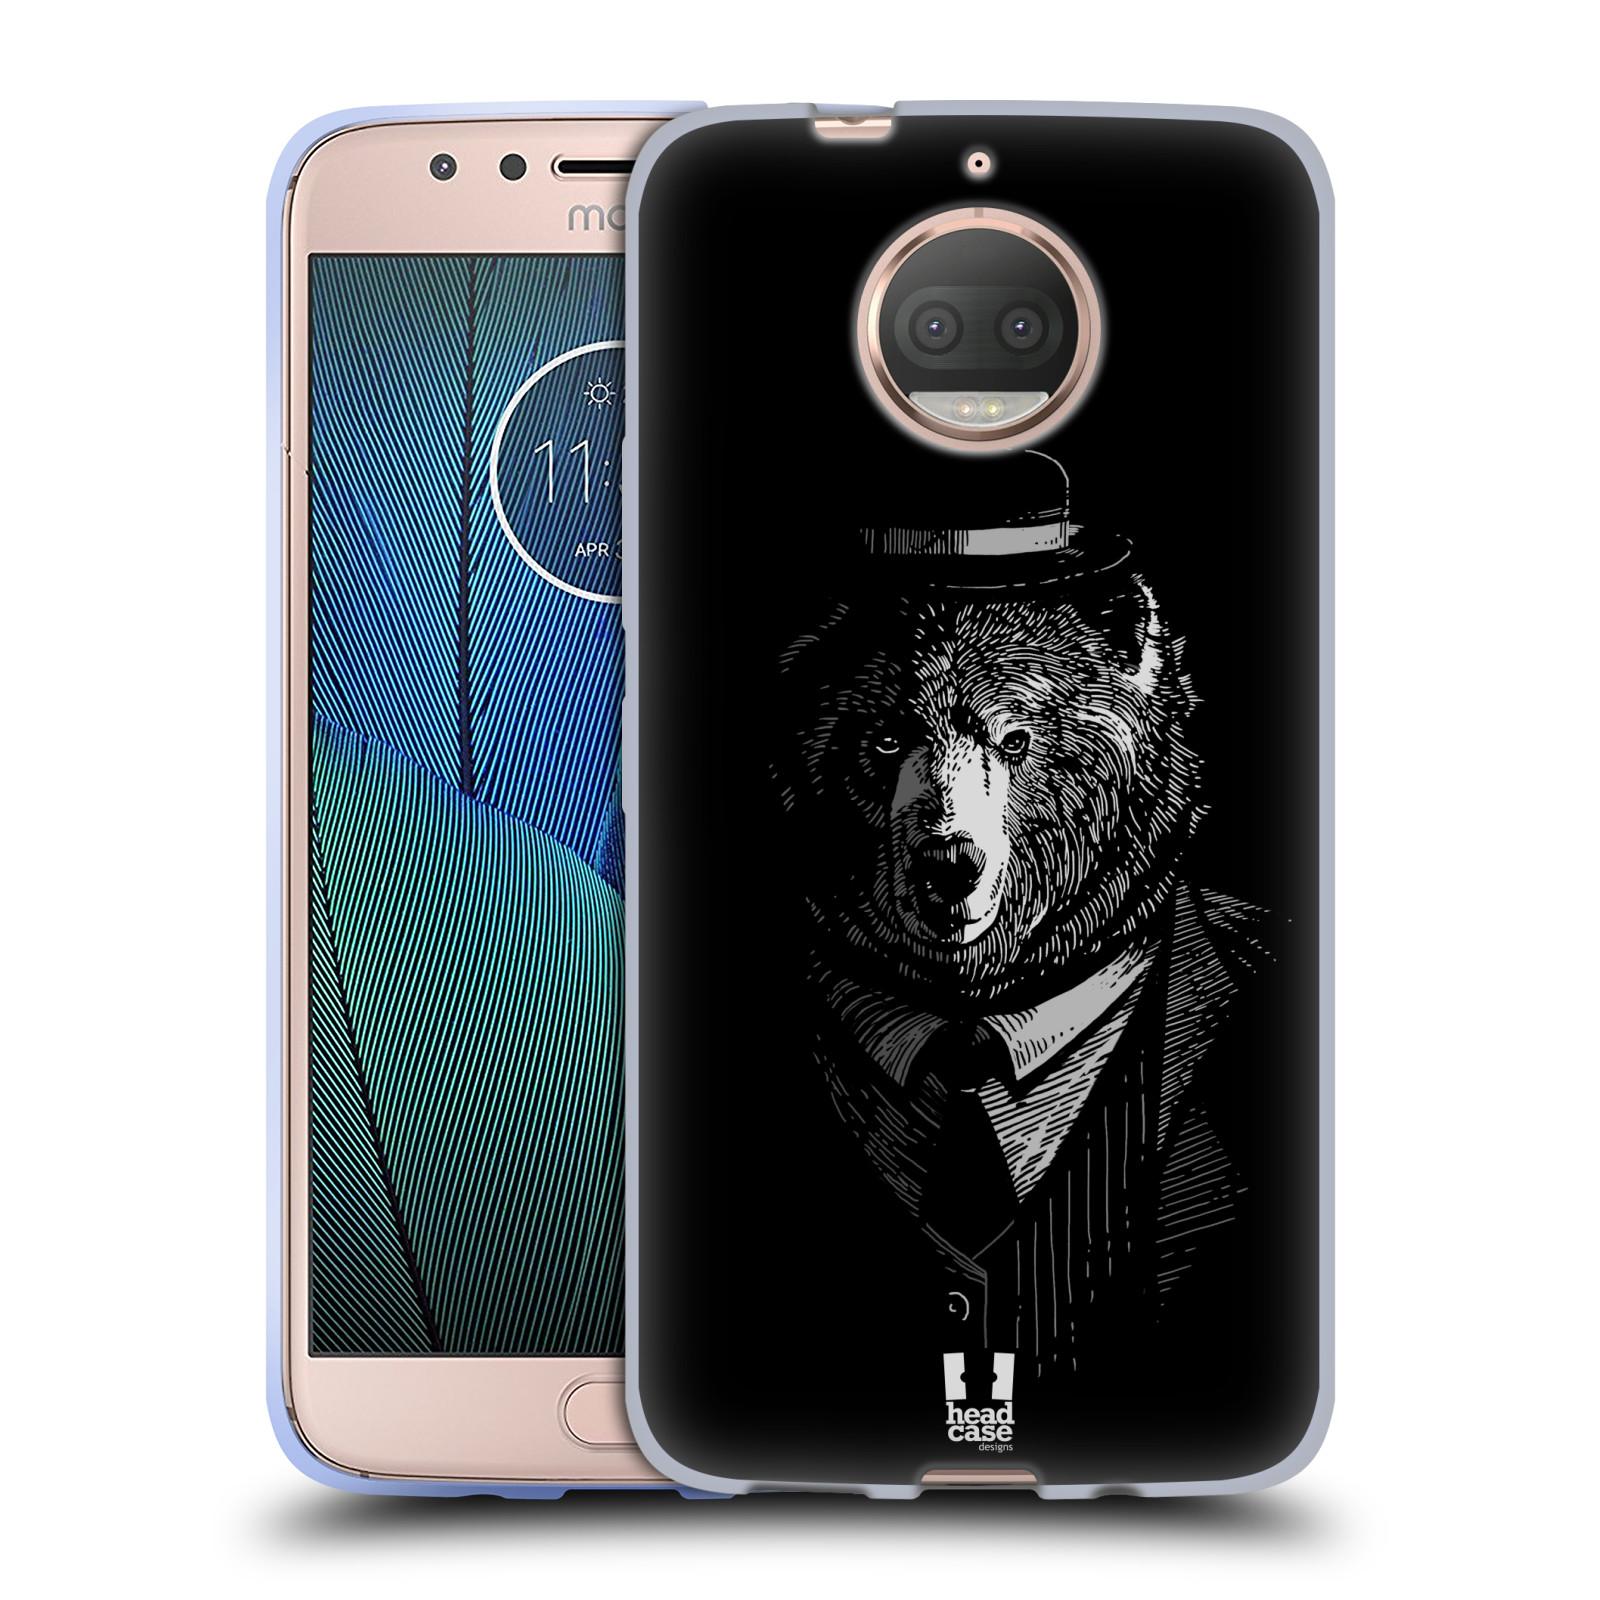 HEAD CASE silikonový obal na mobil Lenovo Moto G5s PLUS vzor Zvíře v obleku medvěd